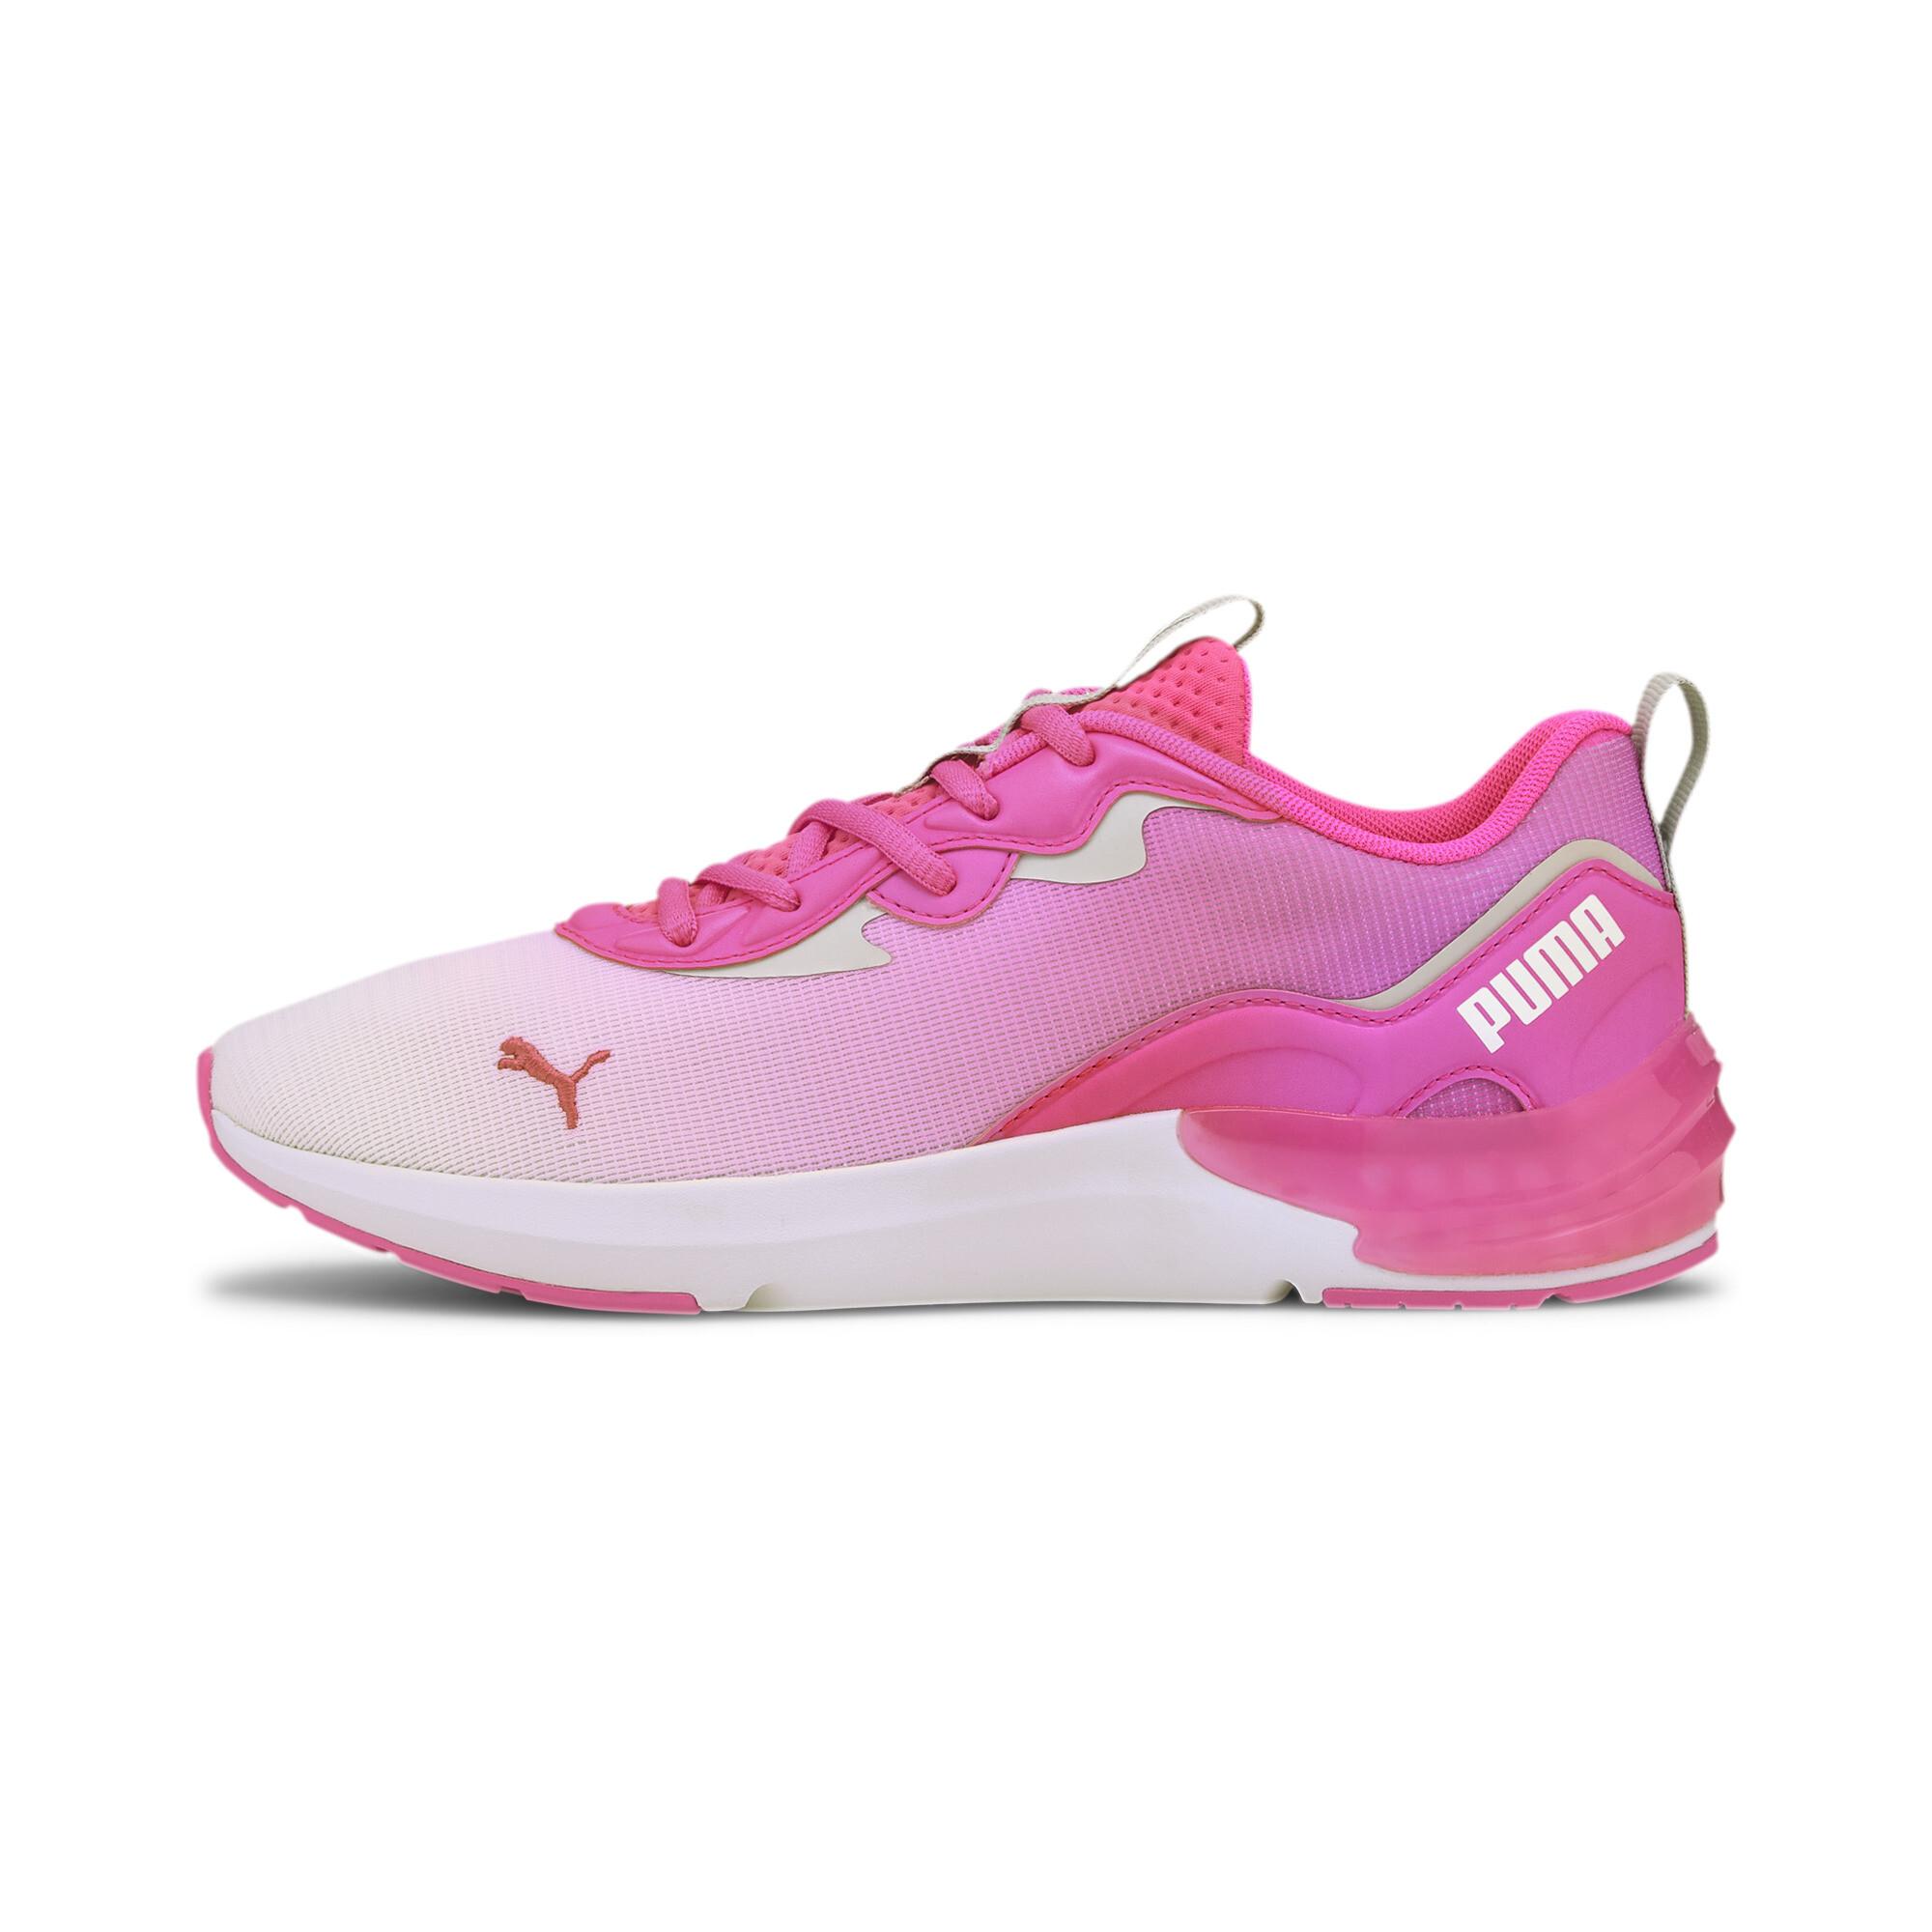 PUMA-Women-039-s-CELL-Initiate-Fade-Training-Shoes thumbnail 4